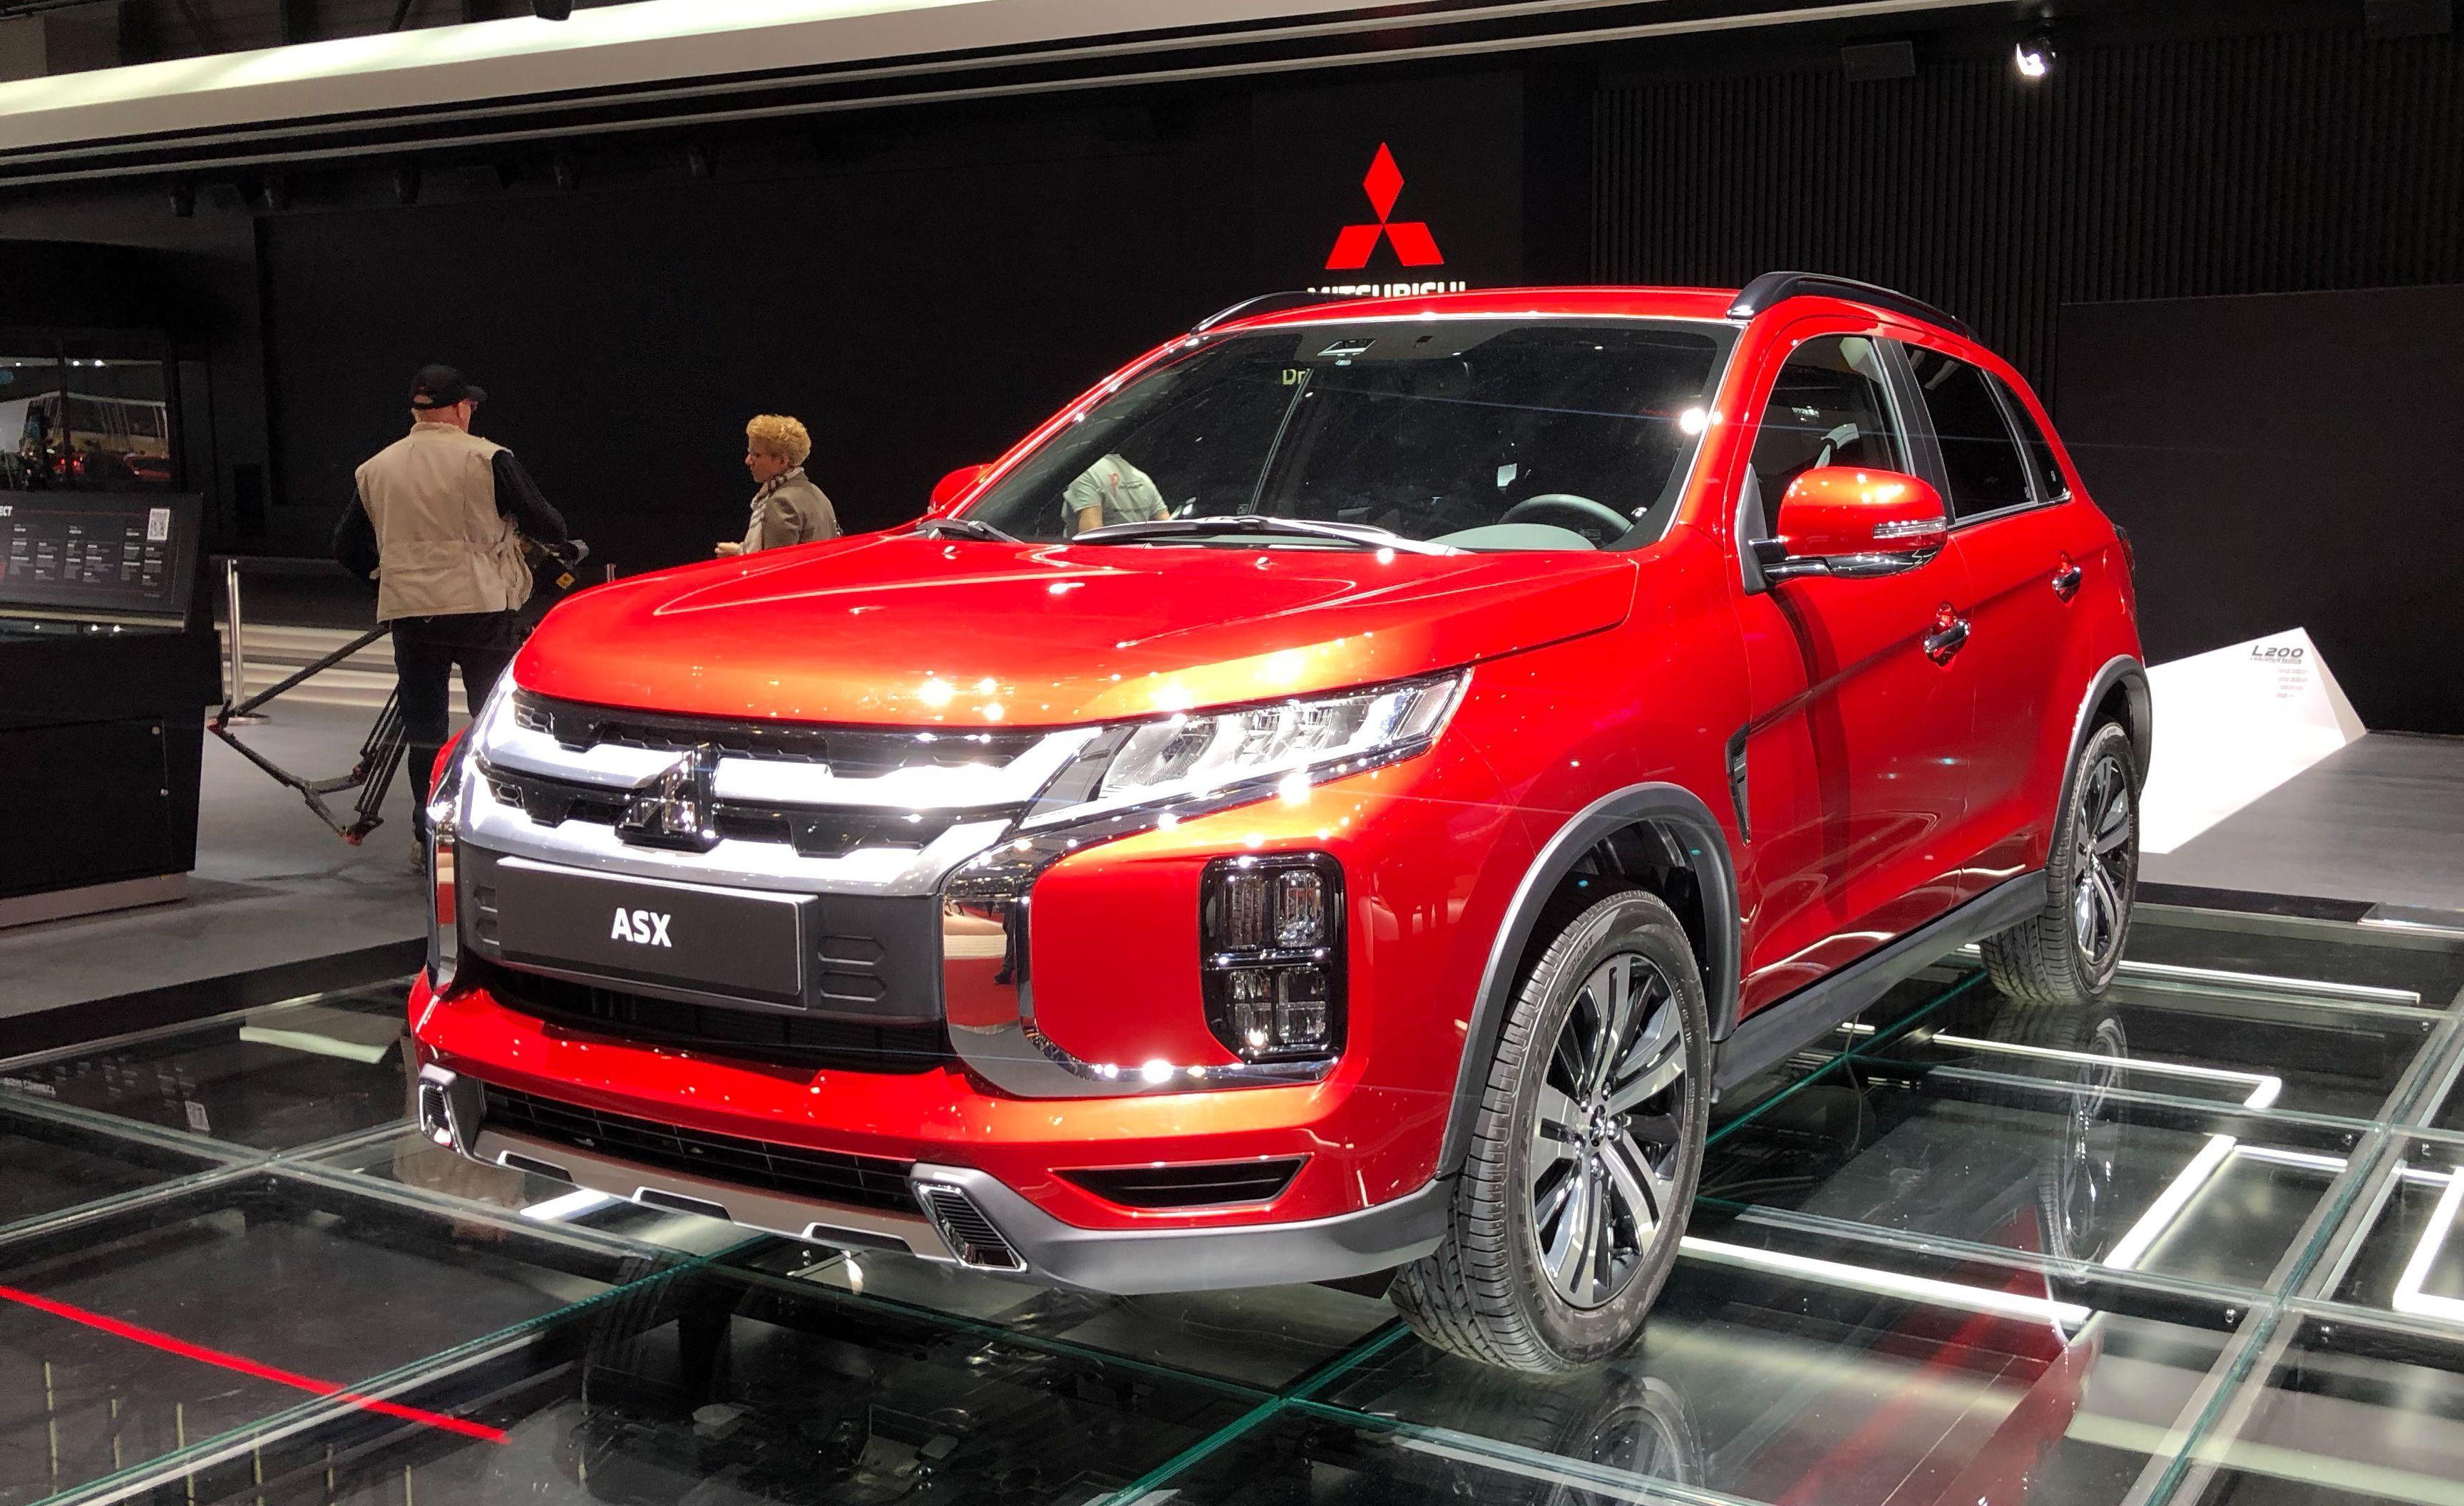 2020 Mitsubishi Outlander Sport Light Updates Make A Big Impact 2020 Mitsubishi Outlander Sport Mitsubishi Motors New Mitsubishi Suv Is In Development Could Fig